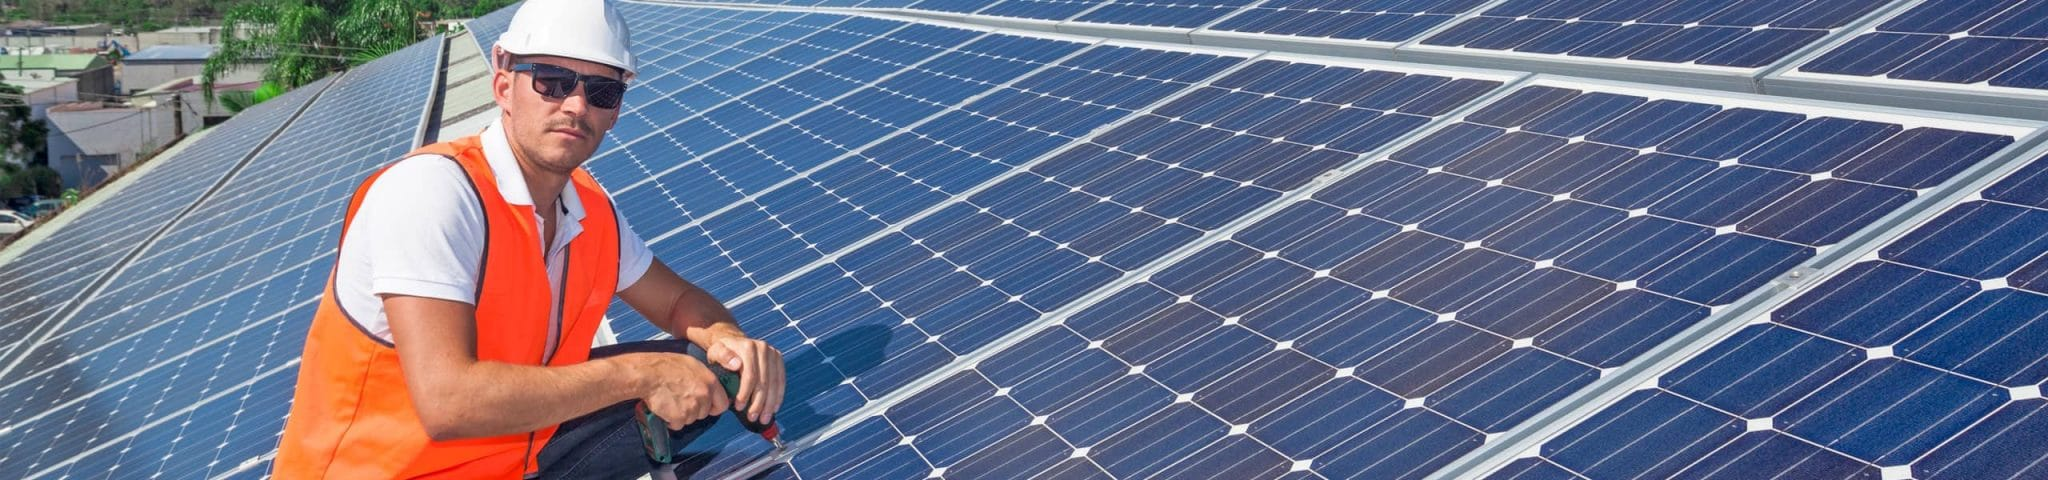 Photo of man fixing solar panel